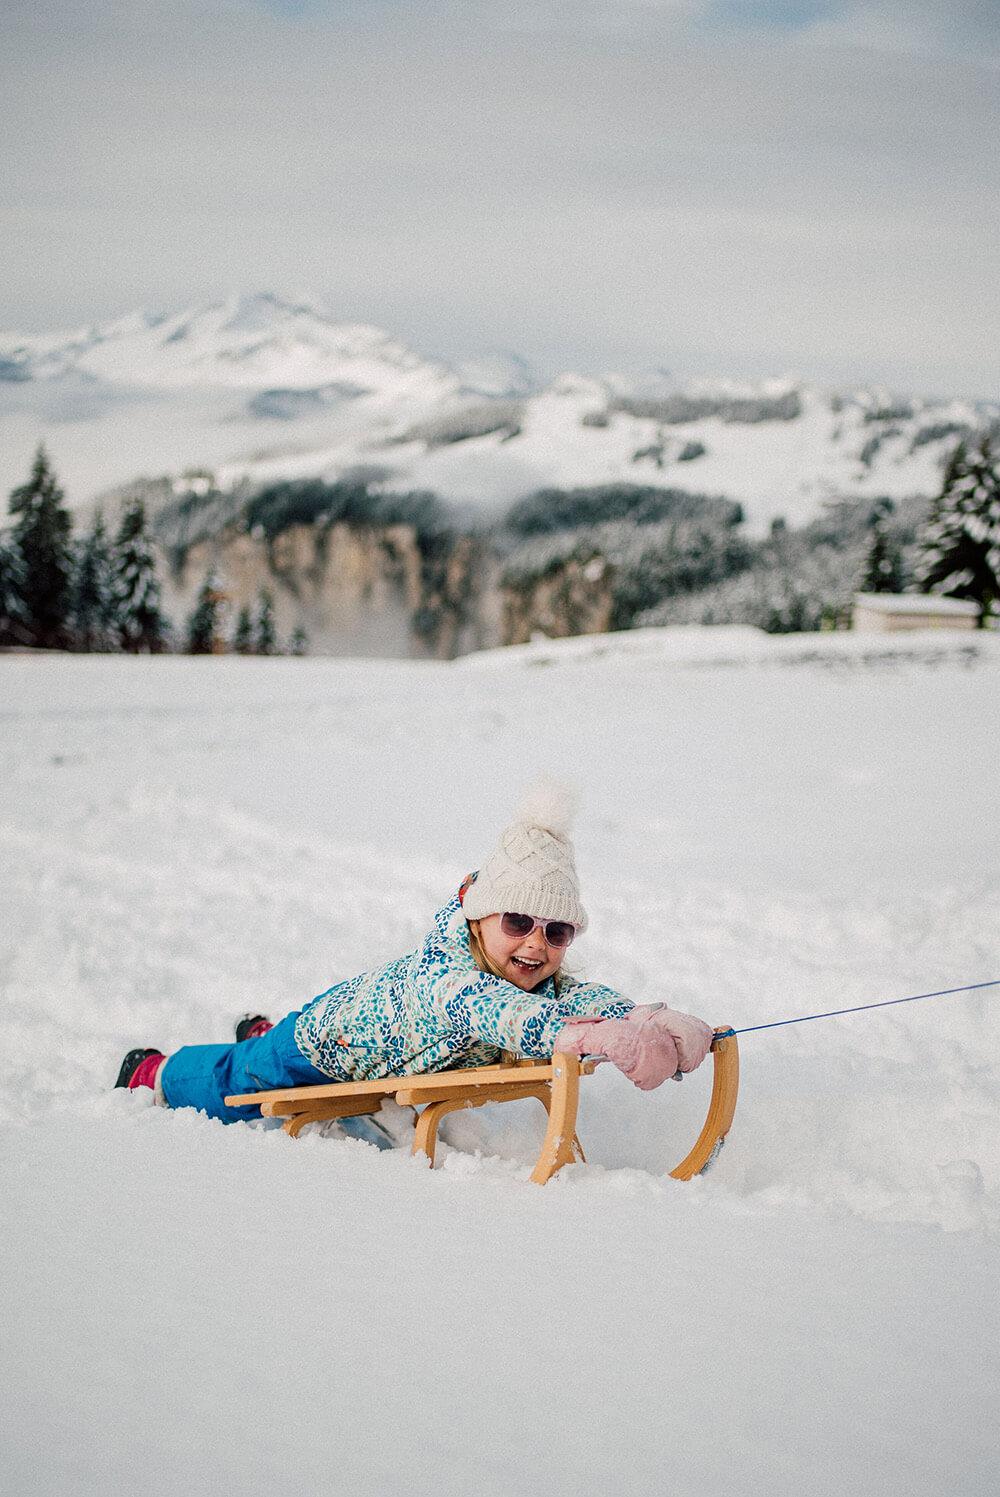 kid on a sledge having fun in snowy avoriaz